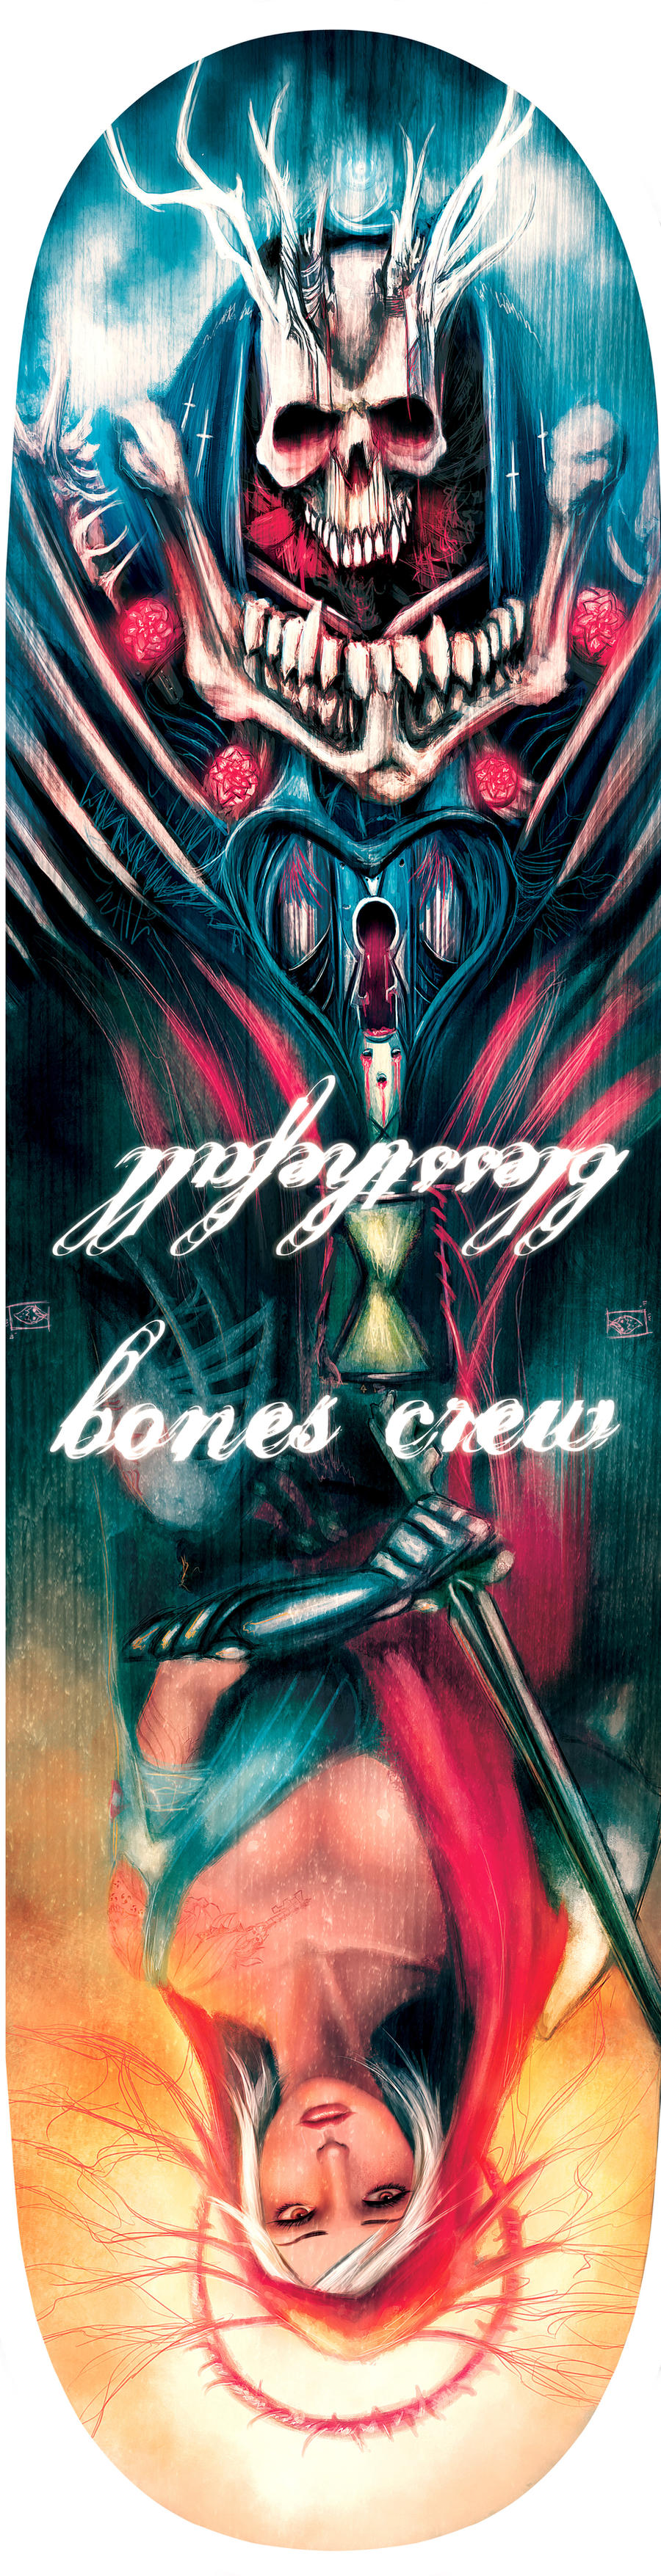 Blessthefall Bones Crew Skatedeck by d3athb3rrymon